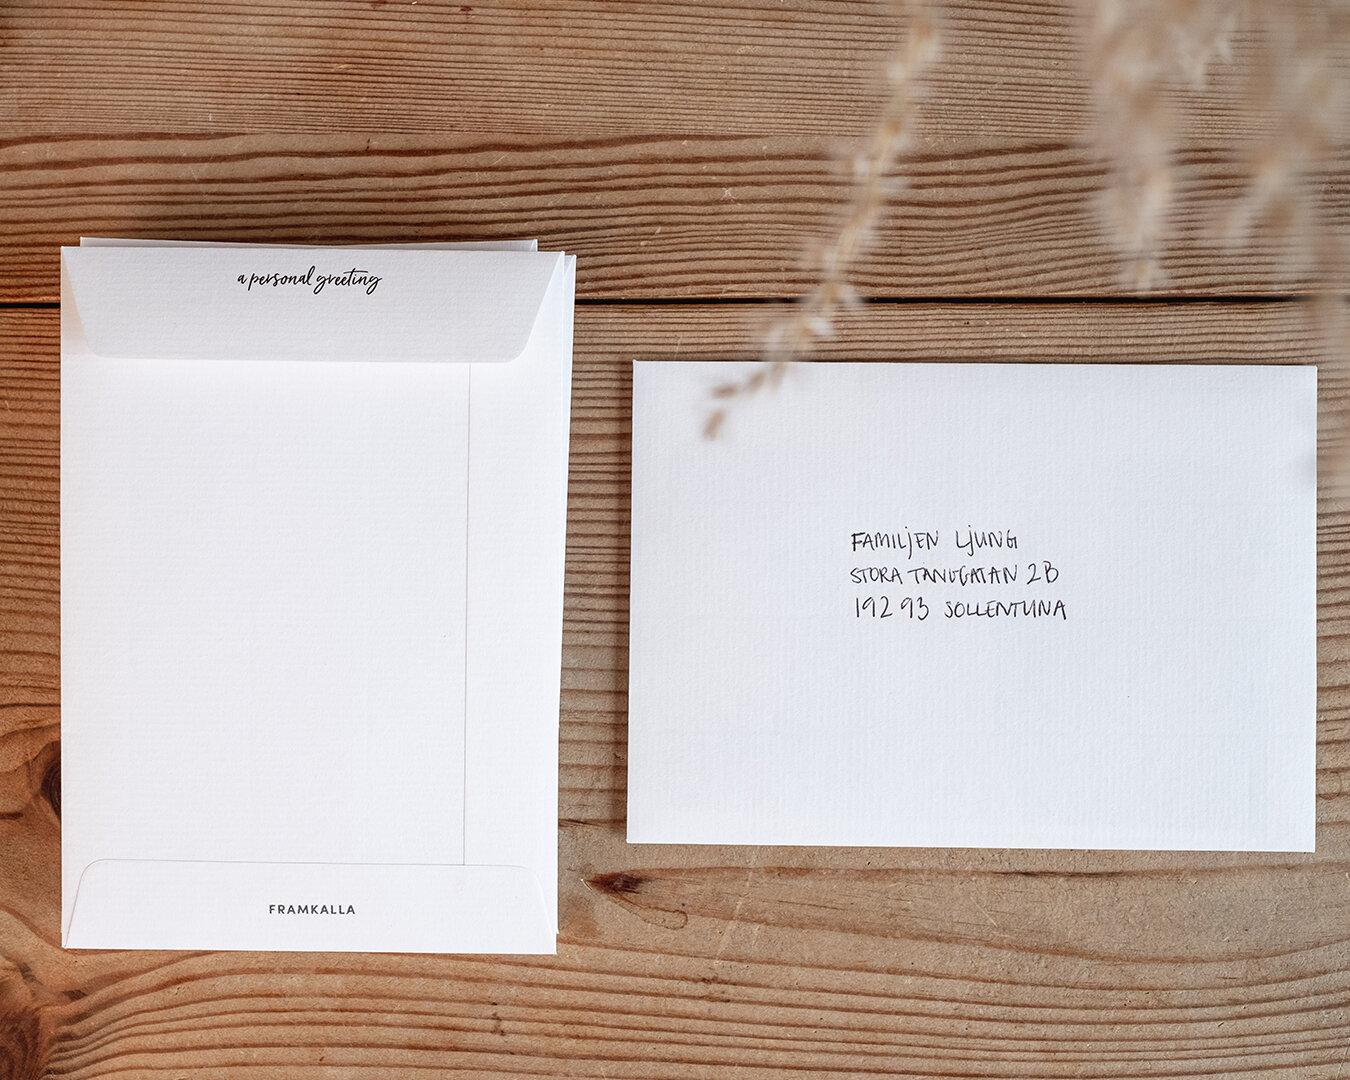 fk-greetingcards-blog-1.jpg